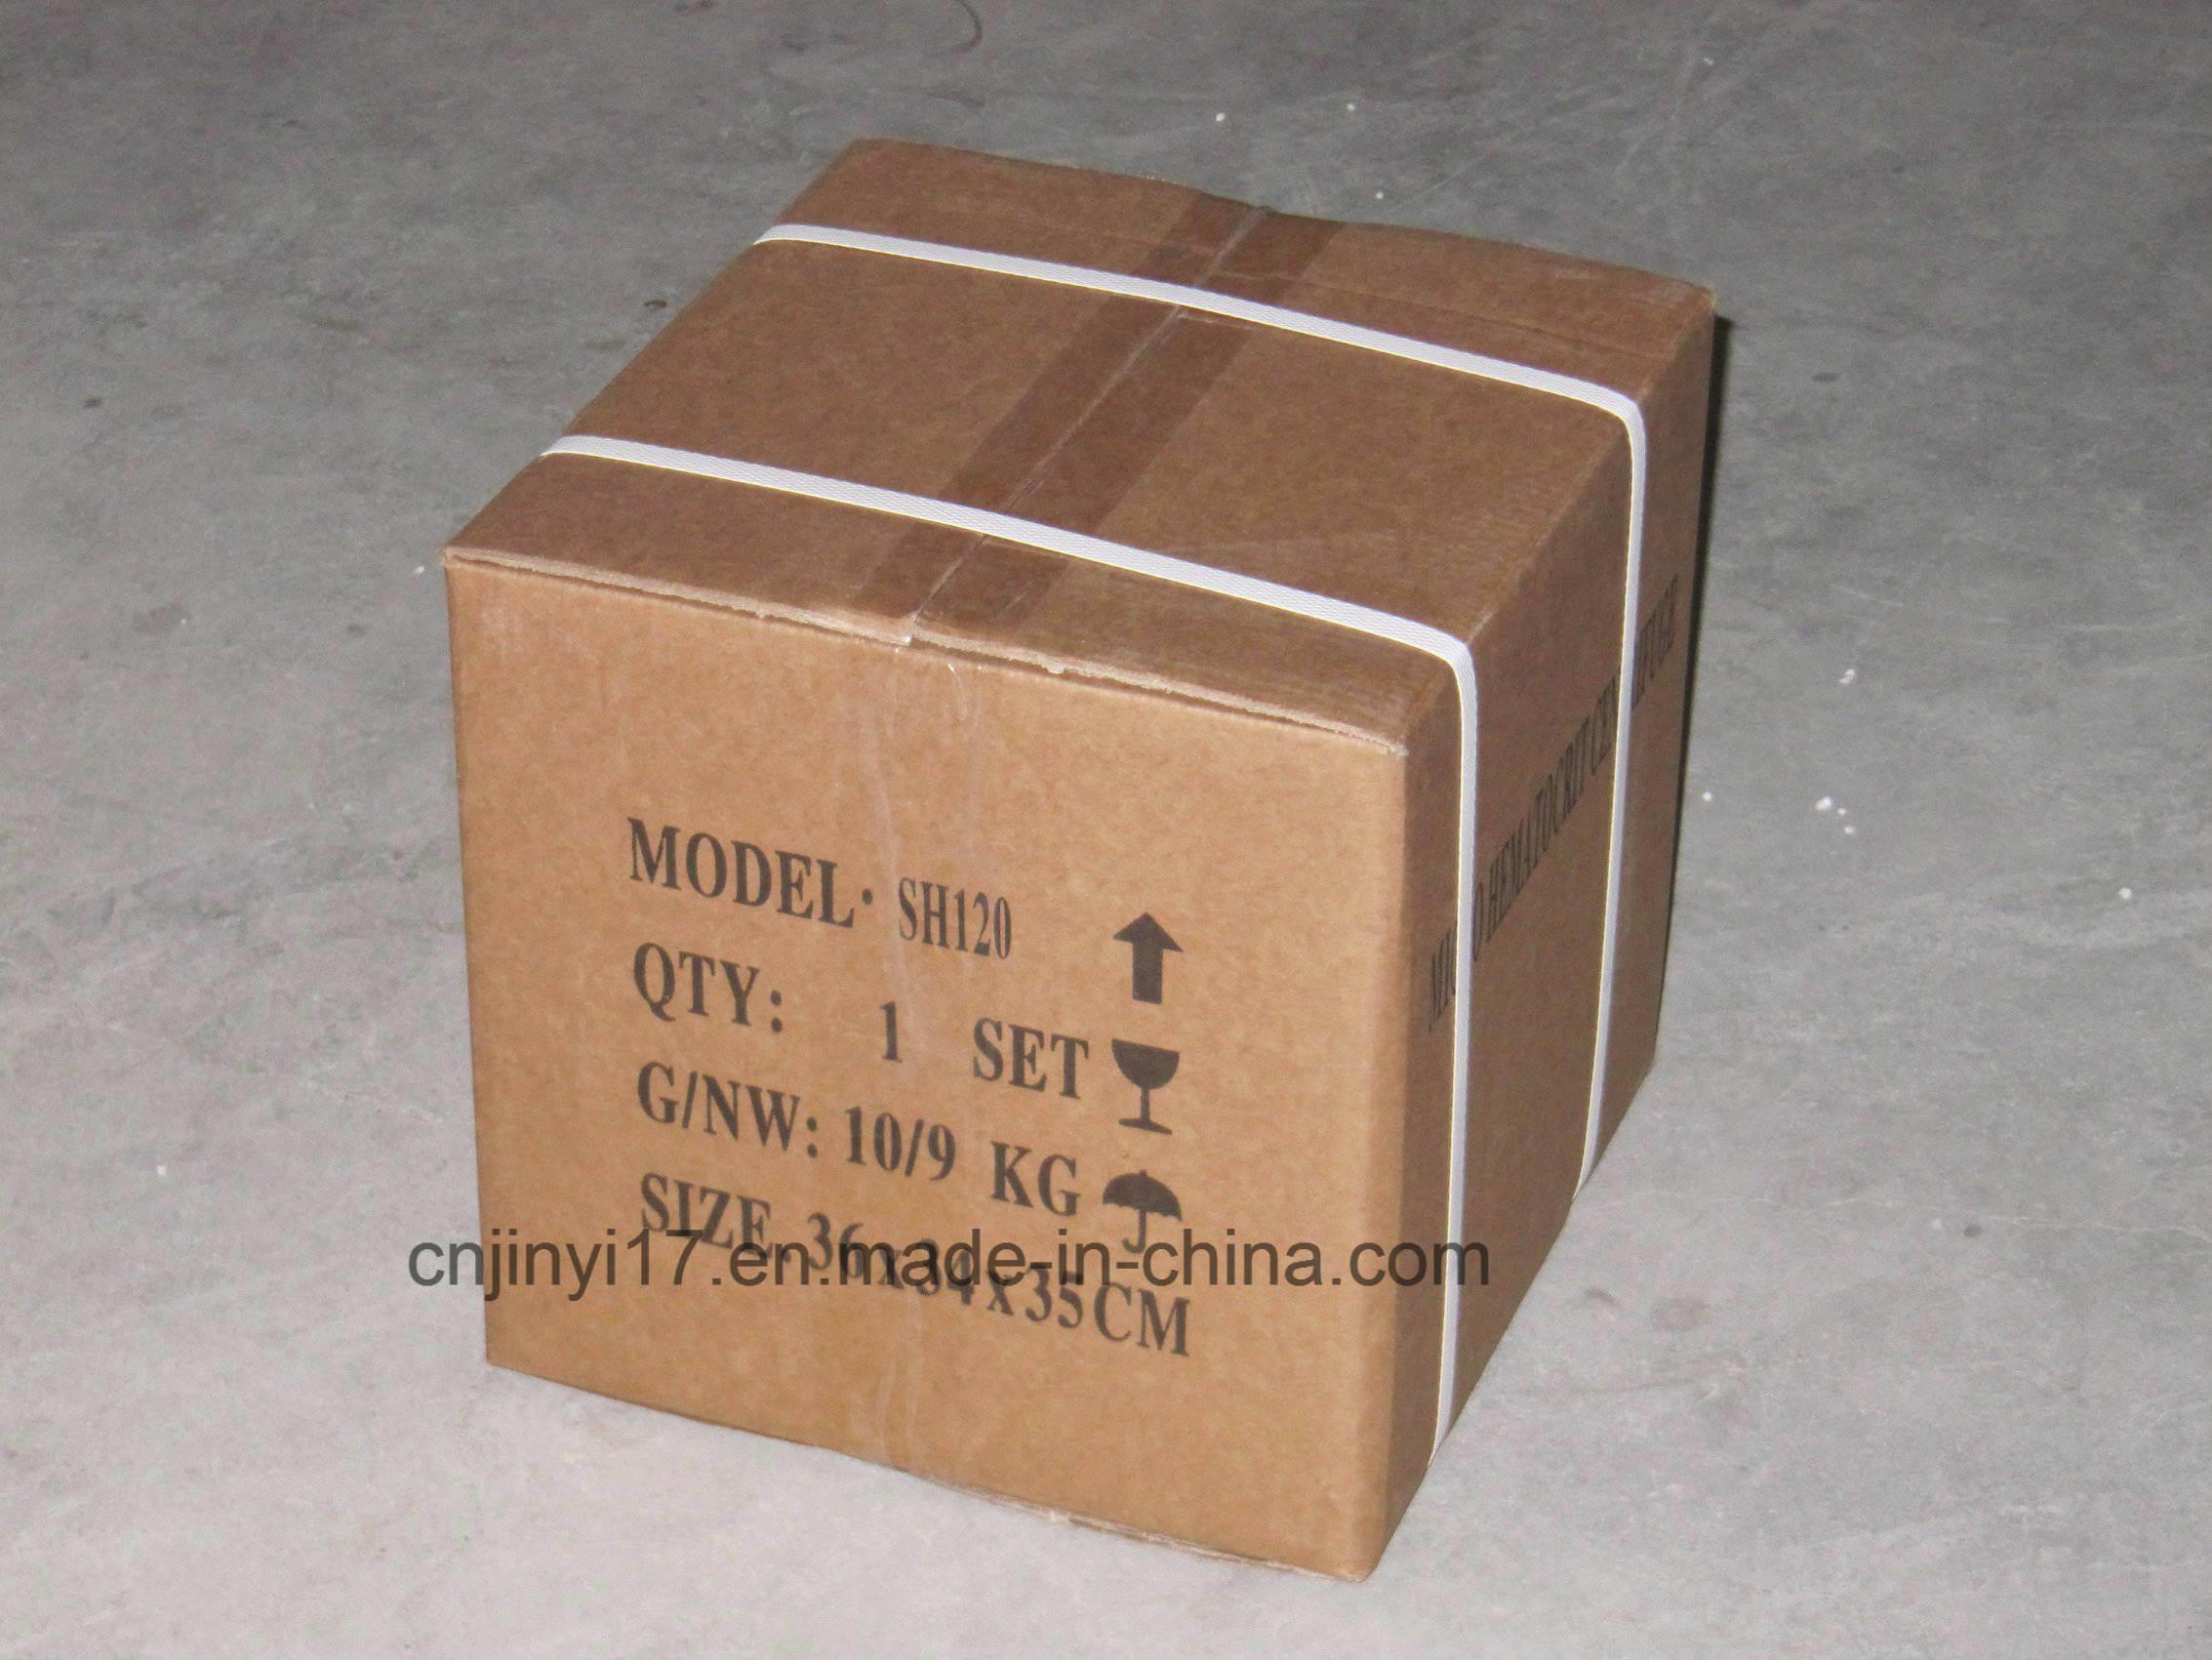 Sh120 Benchtop High Speed Micro Hematocrit Centrifuge